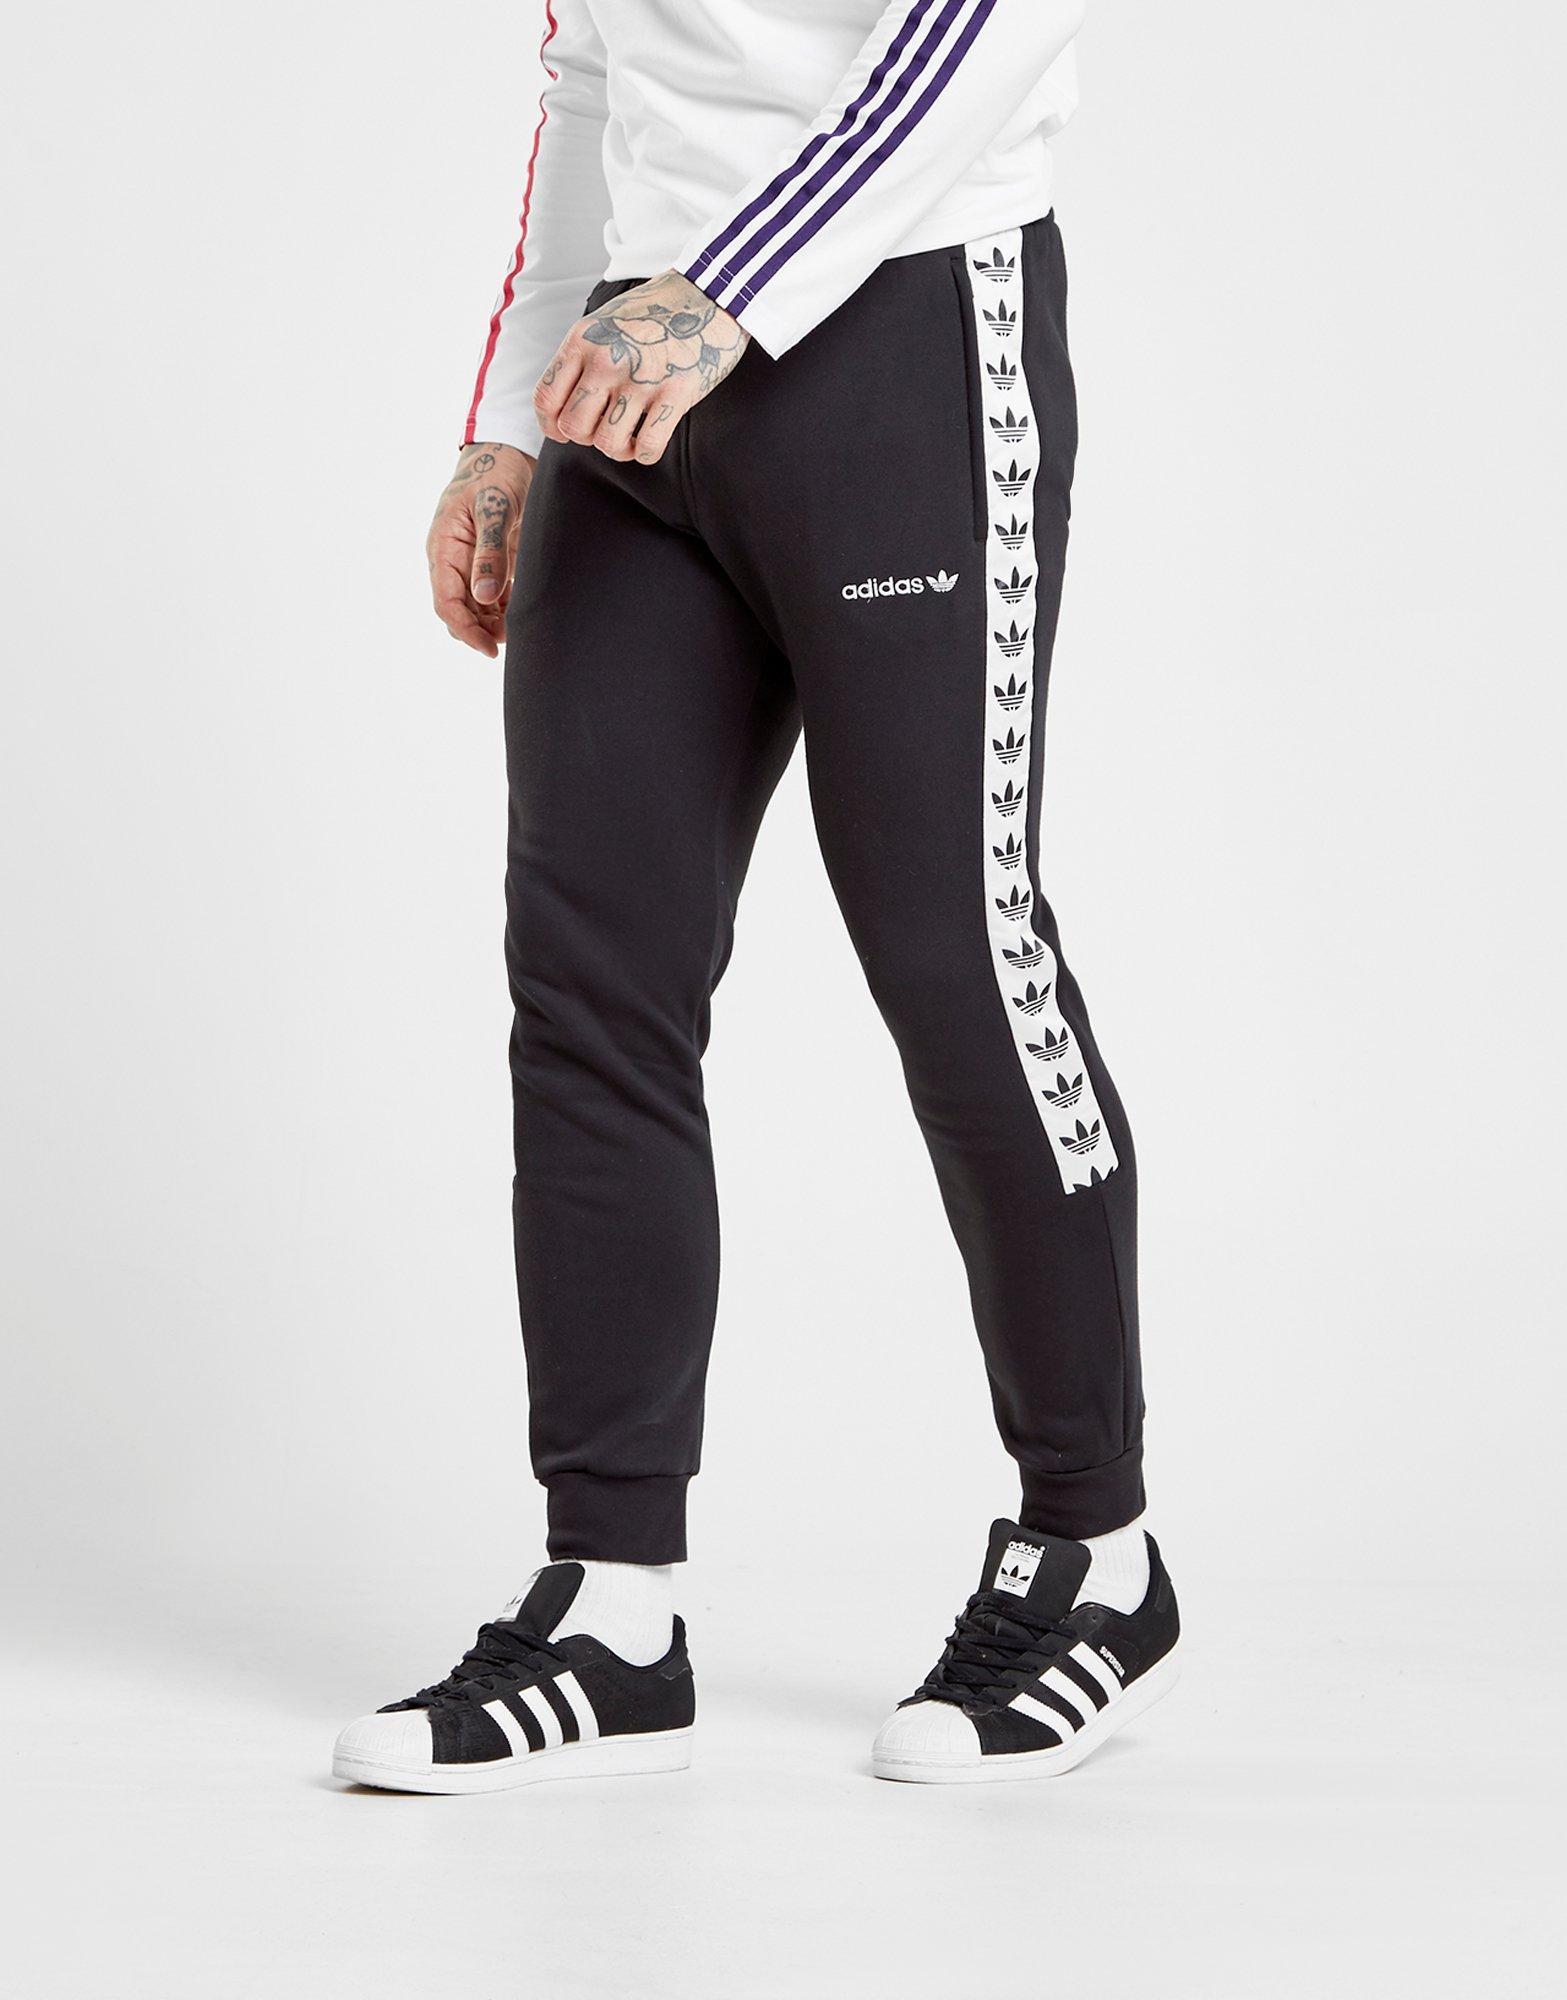 in Tape Adidas Men Fleece Lyst Pants for Track Black Originals pC6w6qn1